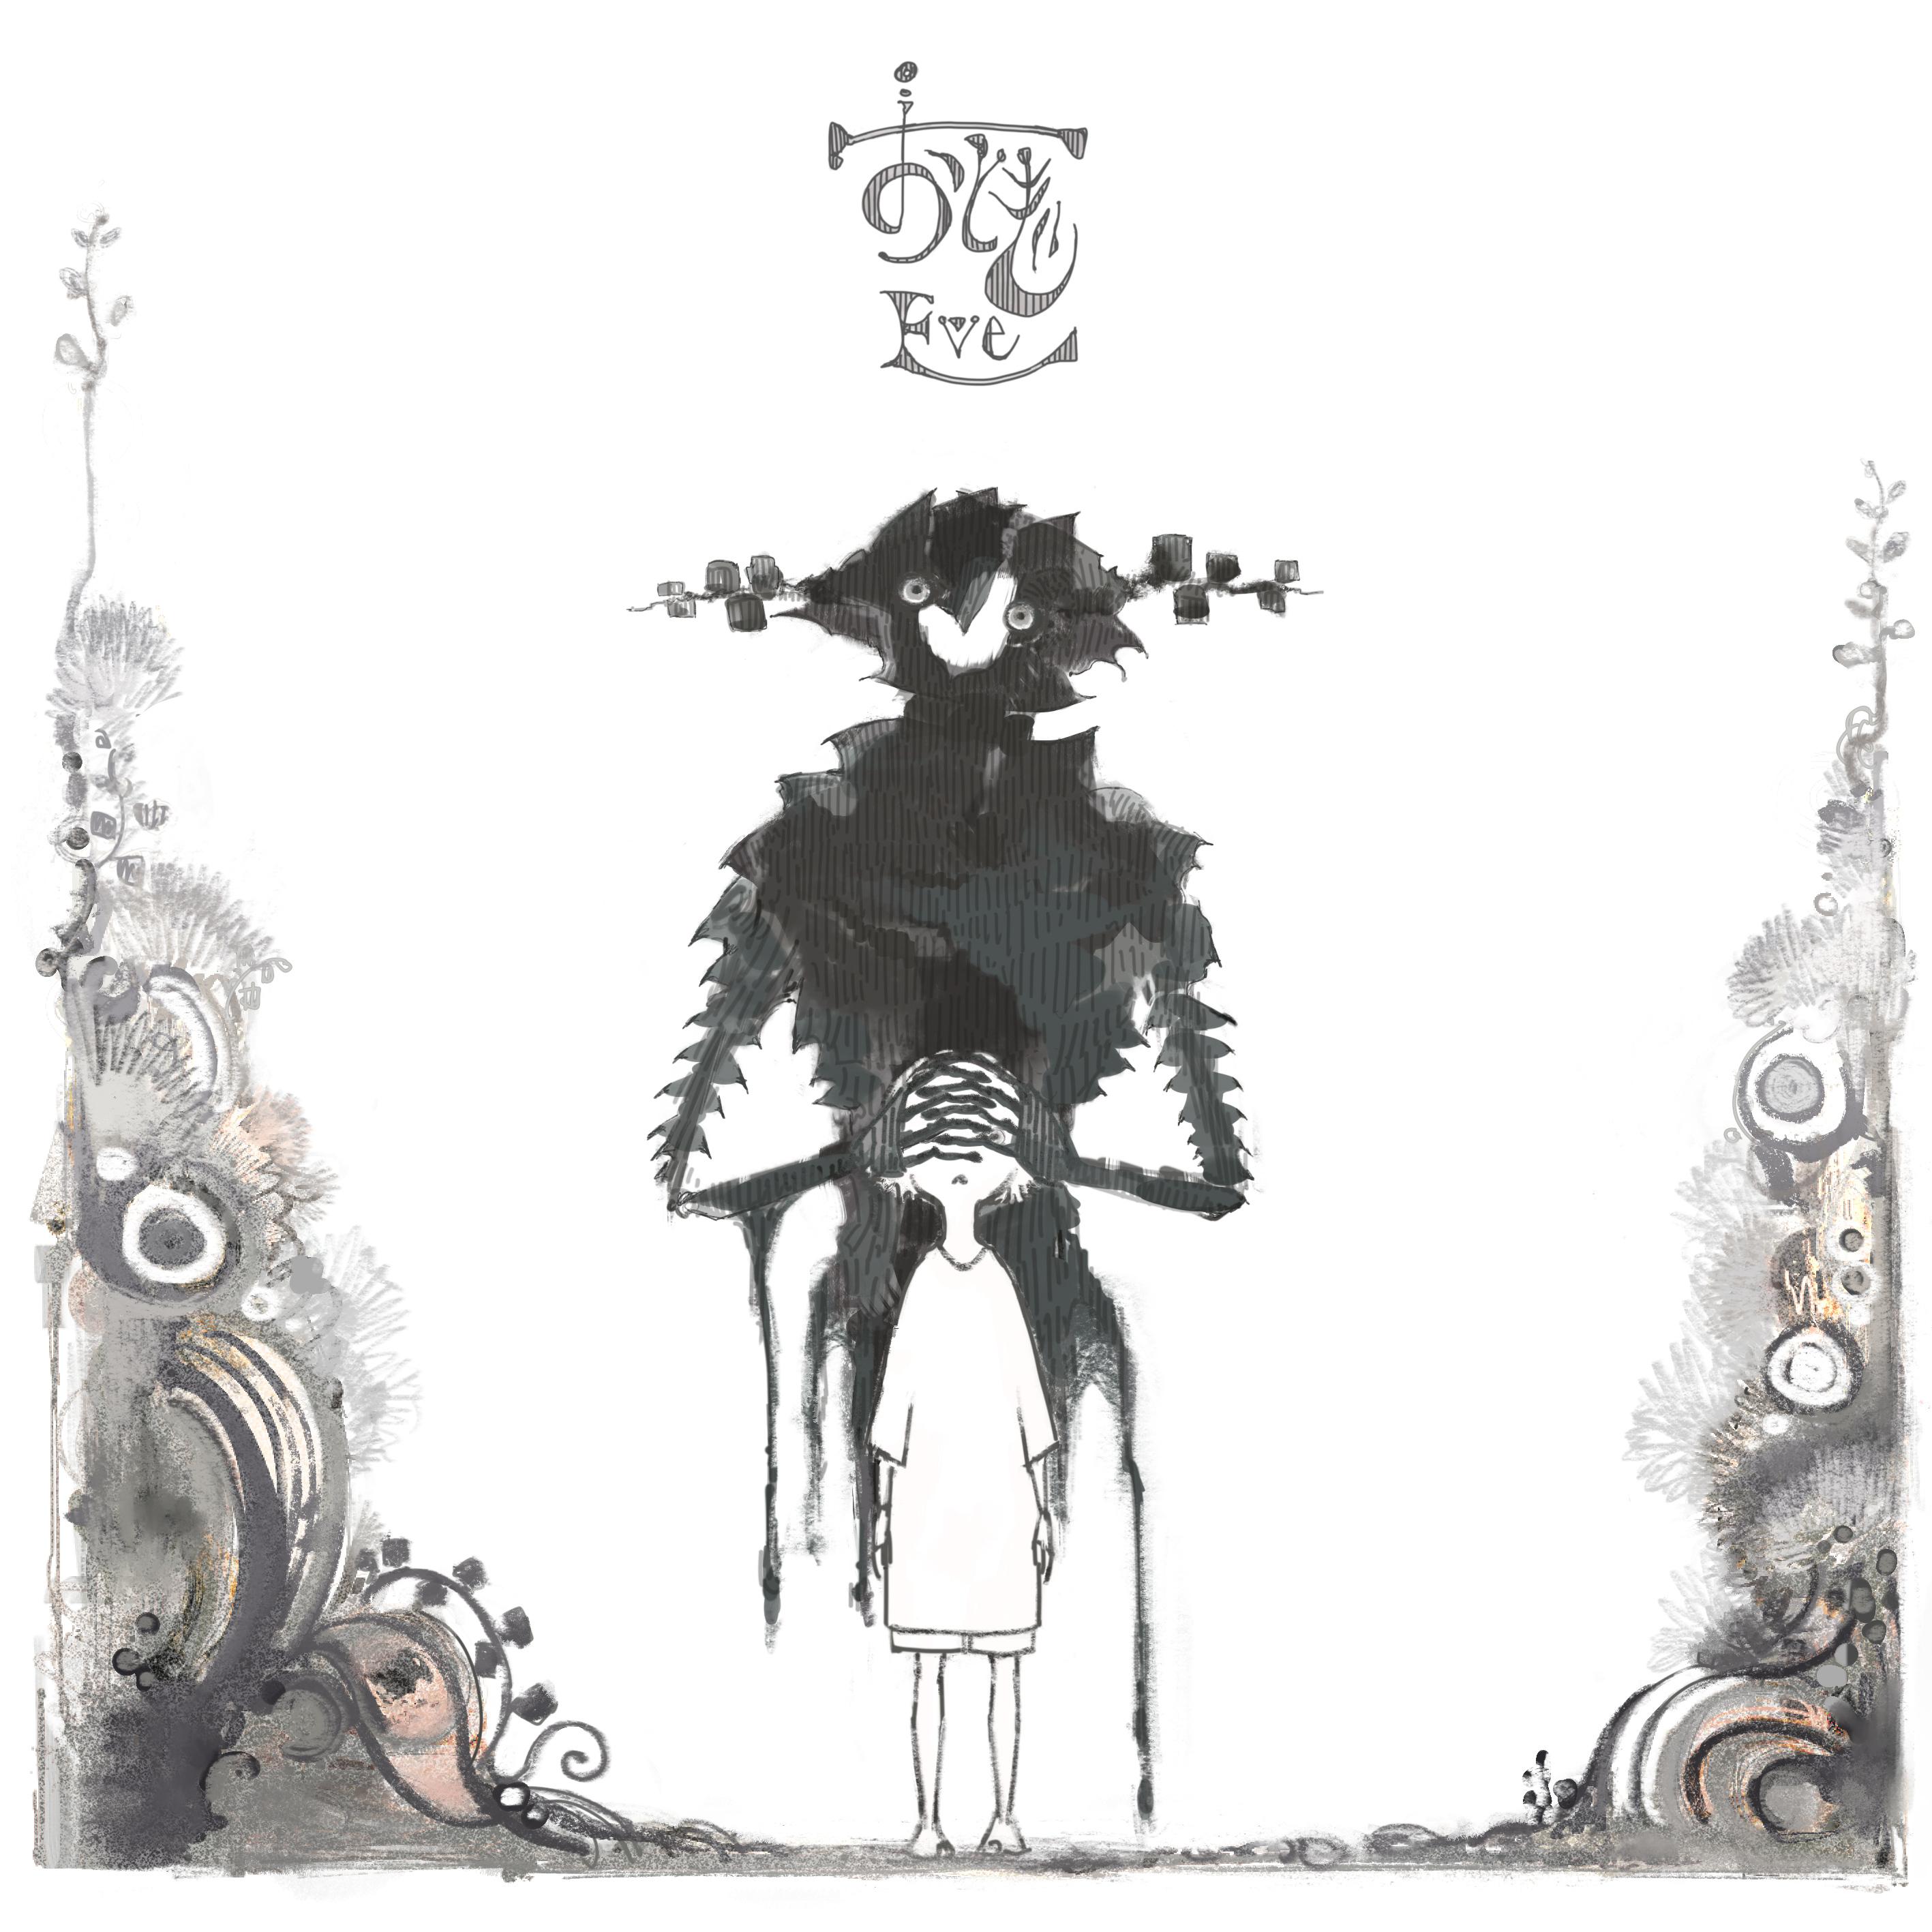 Eve2月にニューアルバムおとぎ発売決定 ジャケットデザイン